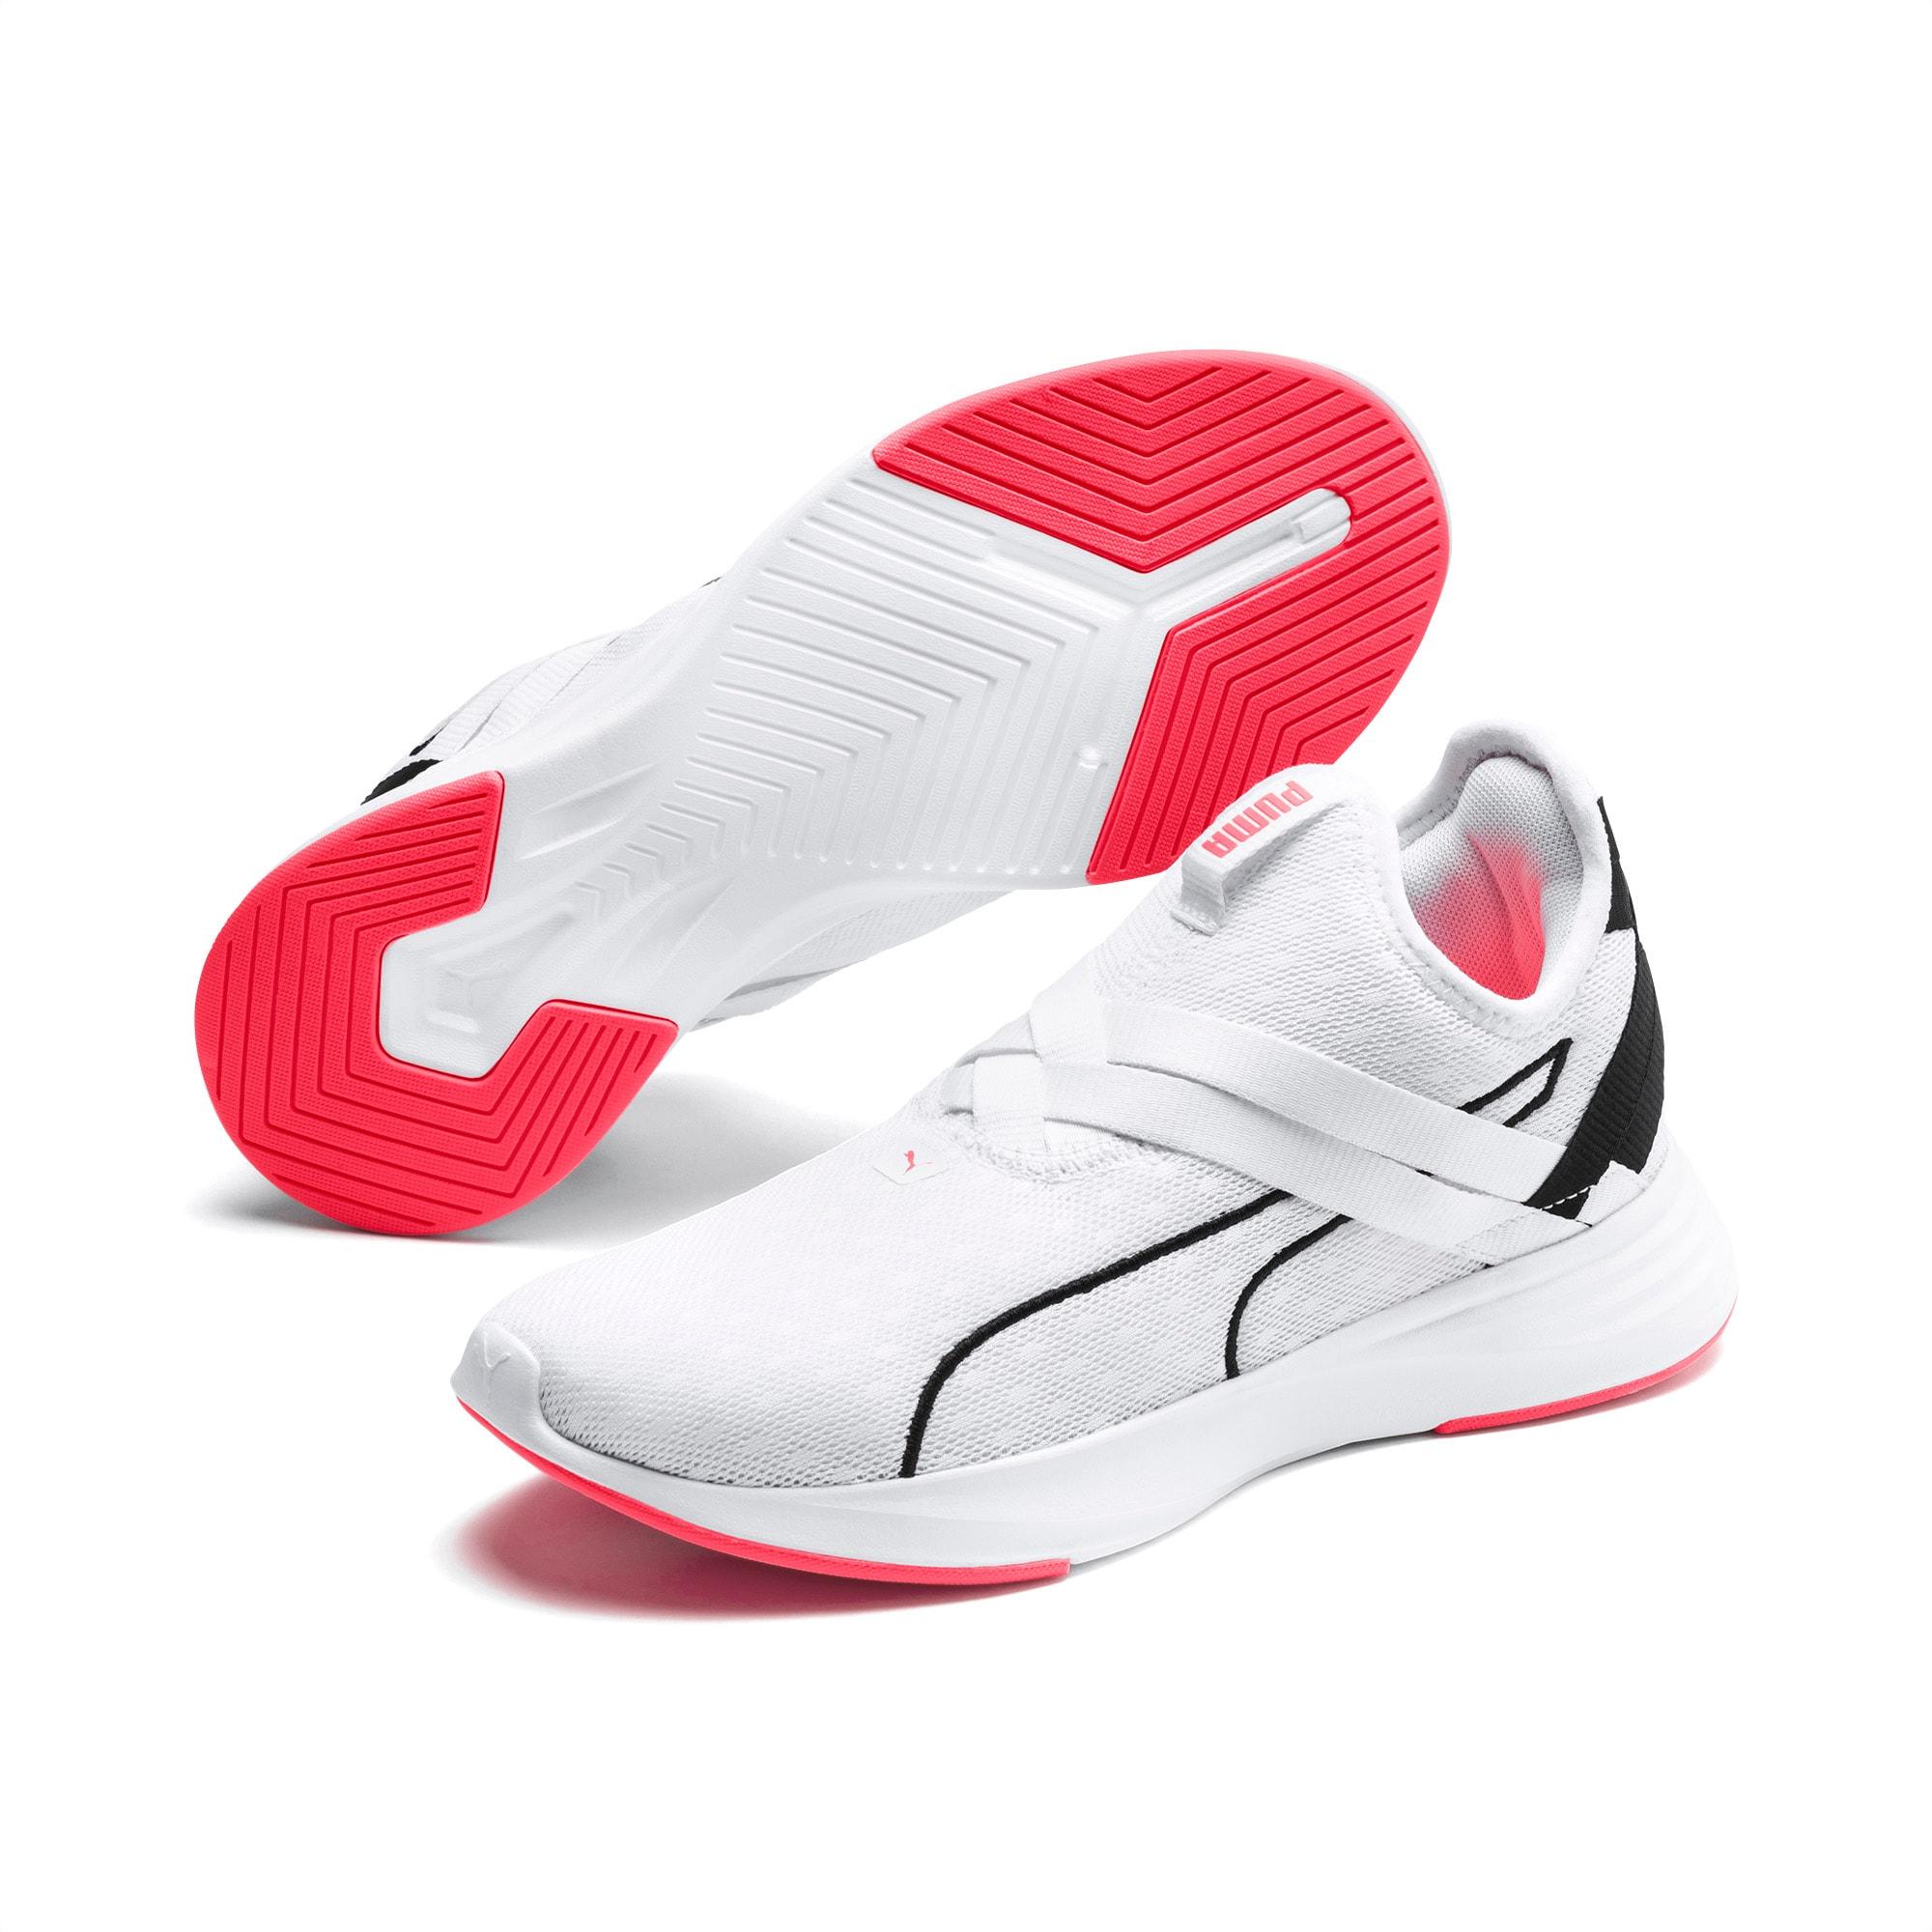 Radiate XT Slip On NC Women's Training Shoes | PUMA US